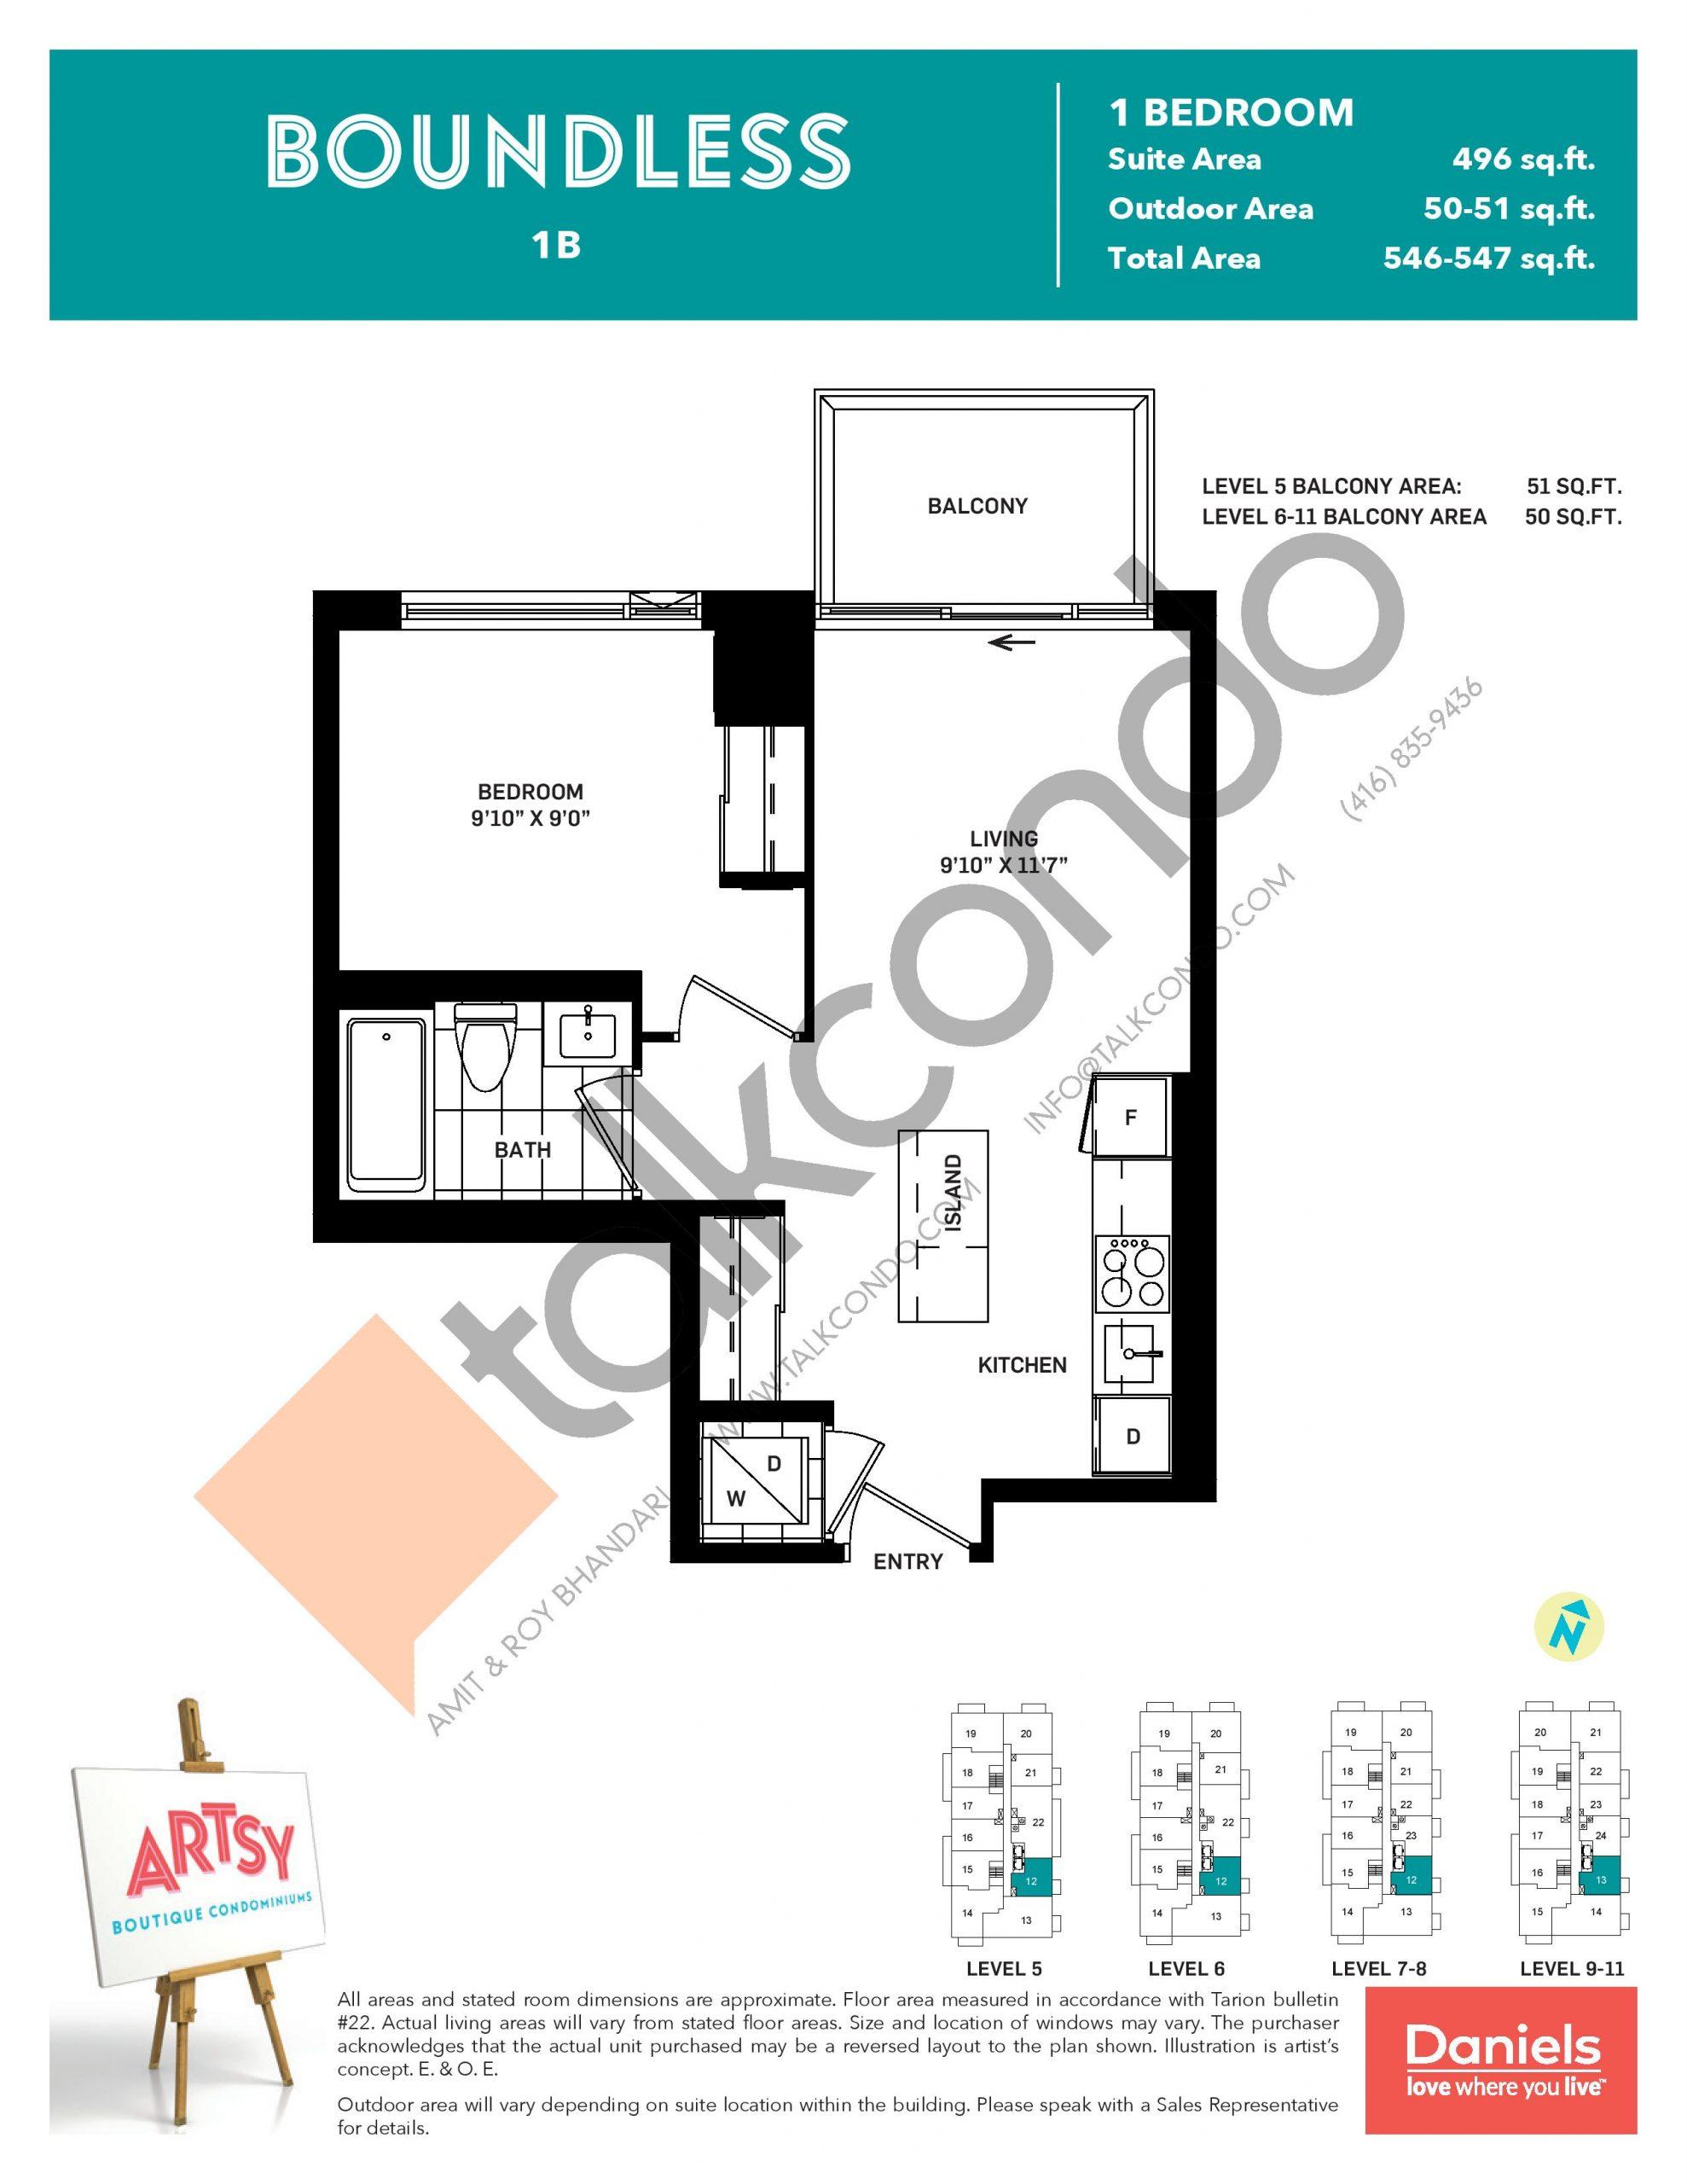 Boundless Floor Plan at Artsy Boutique Condos - 496 sq.ft